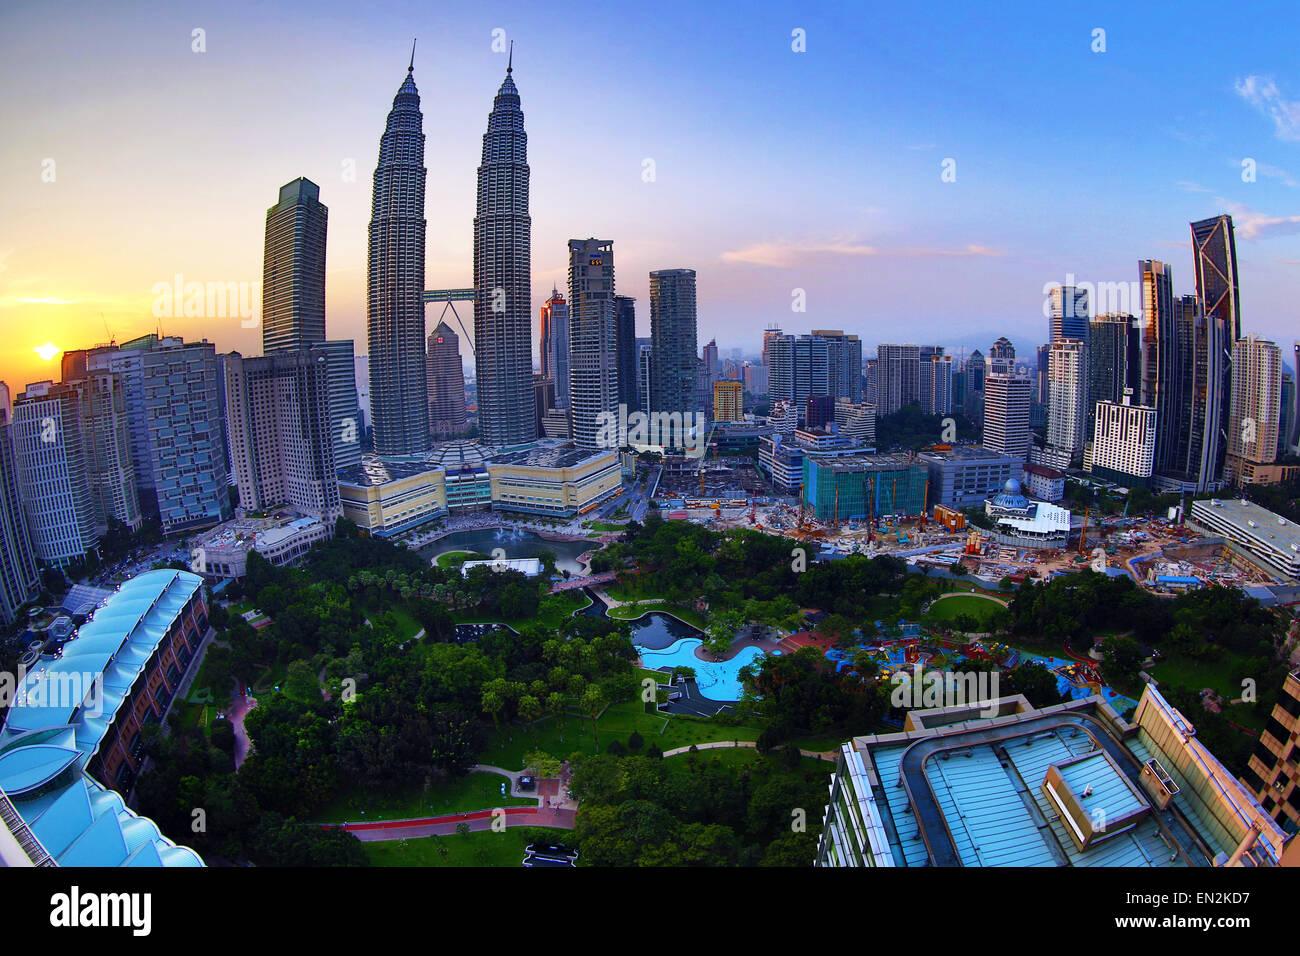 Petronas Twin Towers skyscrapers at sunset, KLCC, Kuala Lumpur, Malaysia - Stock Image